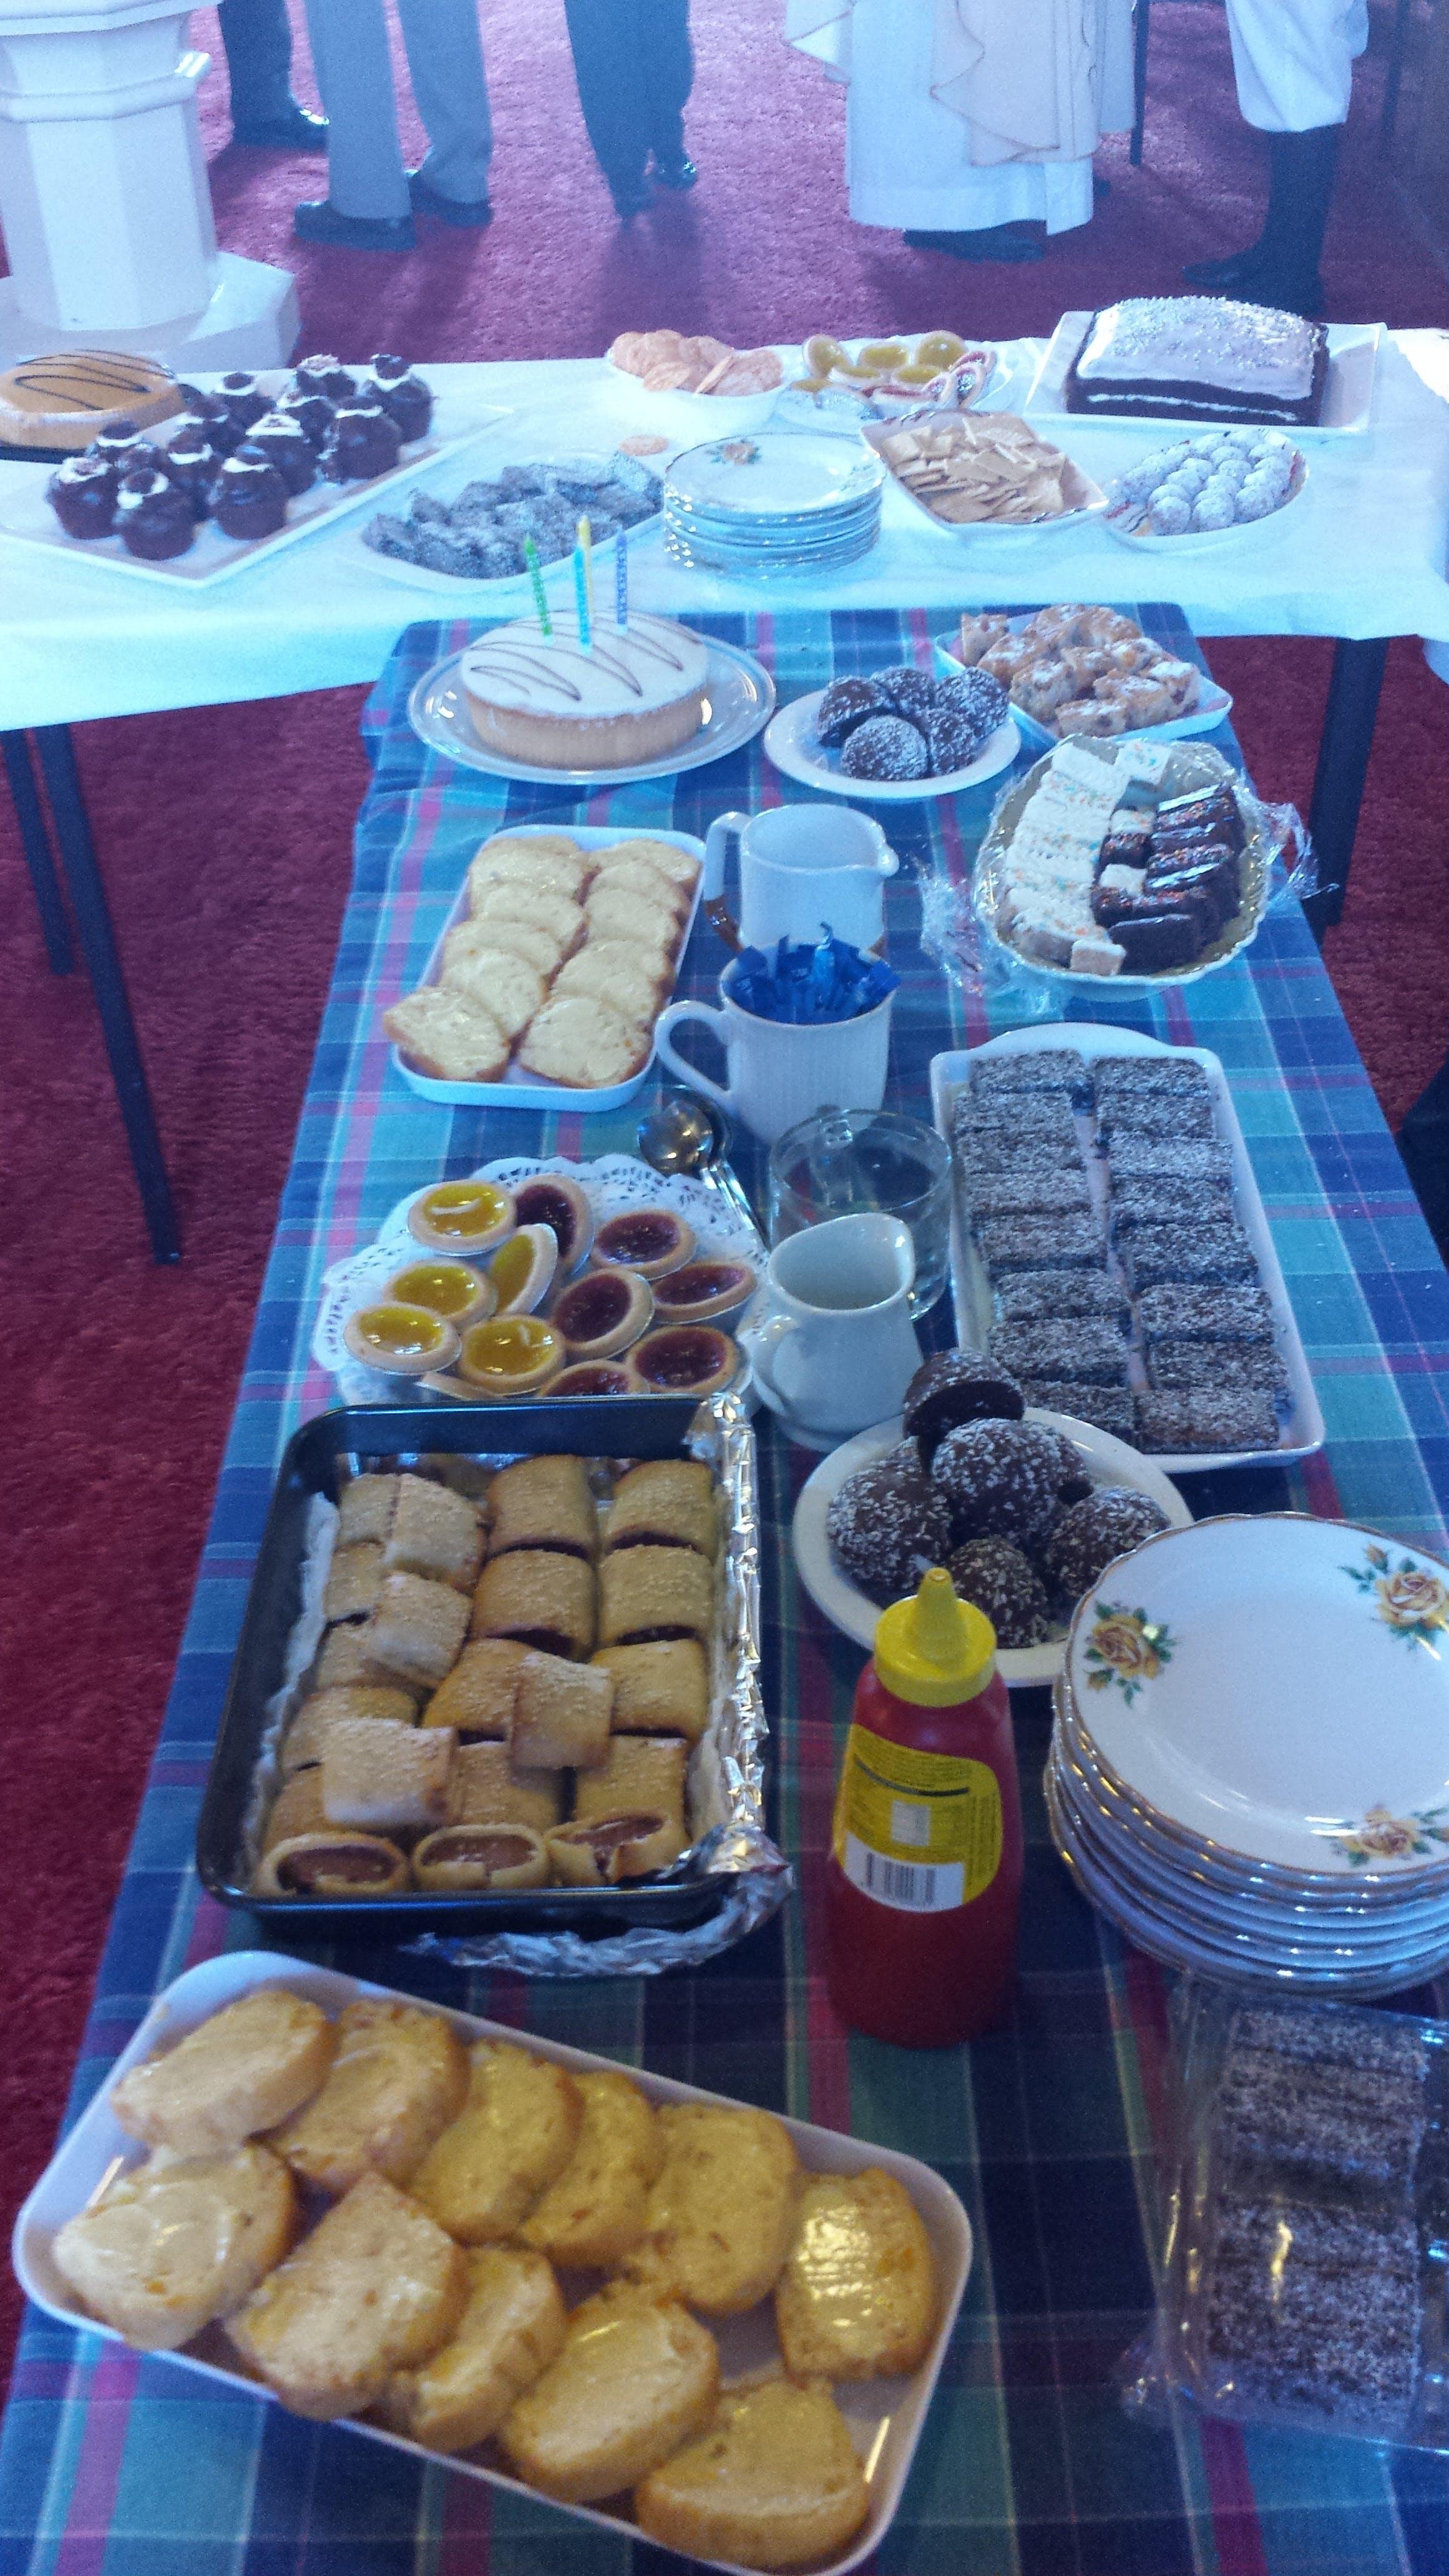 Free stock photo of food, people, church, cake